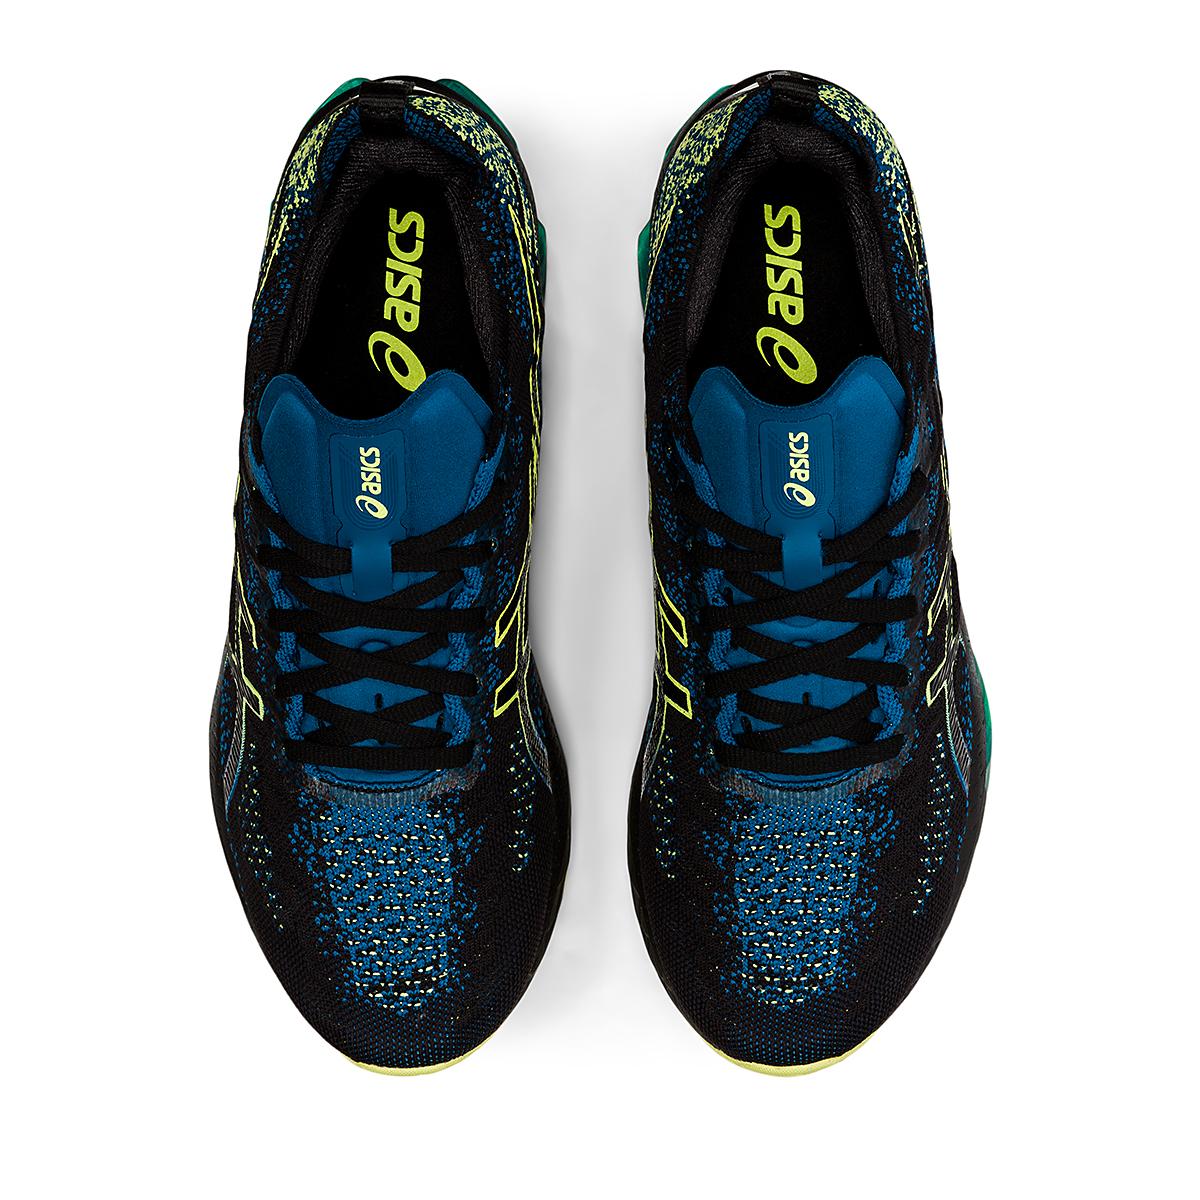 Men's Asics Kinsei Blast Running Shoe - Color: Black/Glow Yellow - Size: 6 - Width: Regular, Black/Glow Yellow, large, image 7